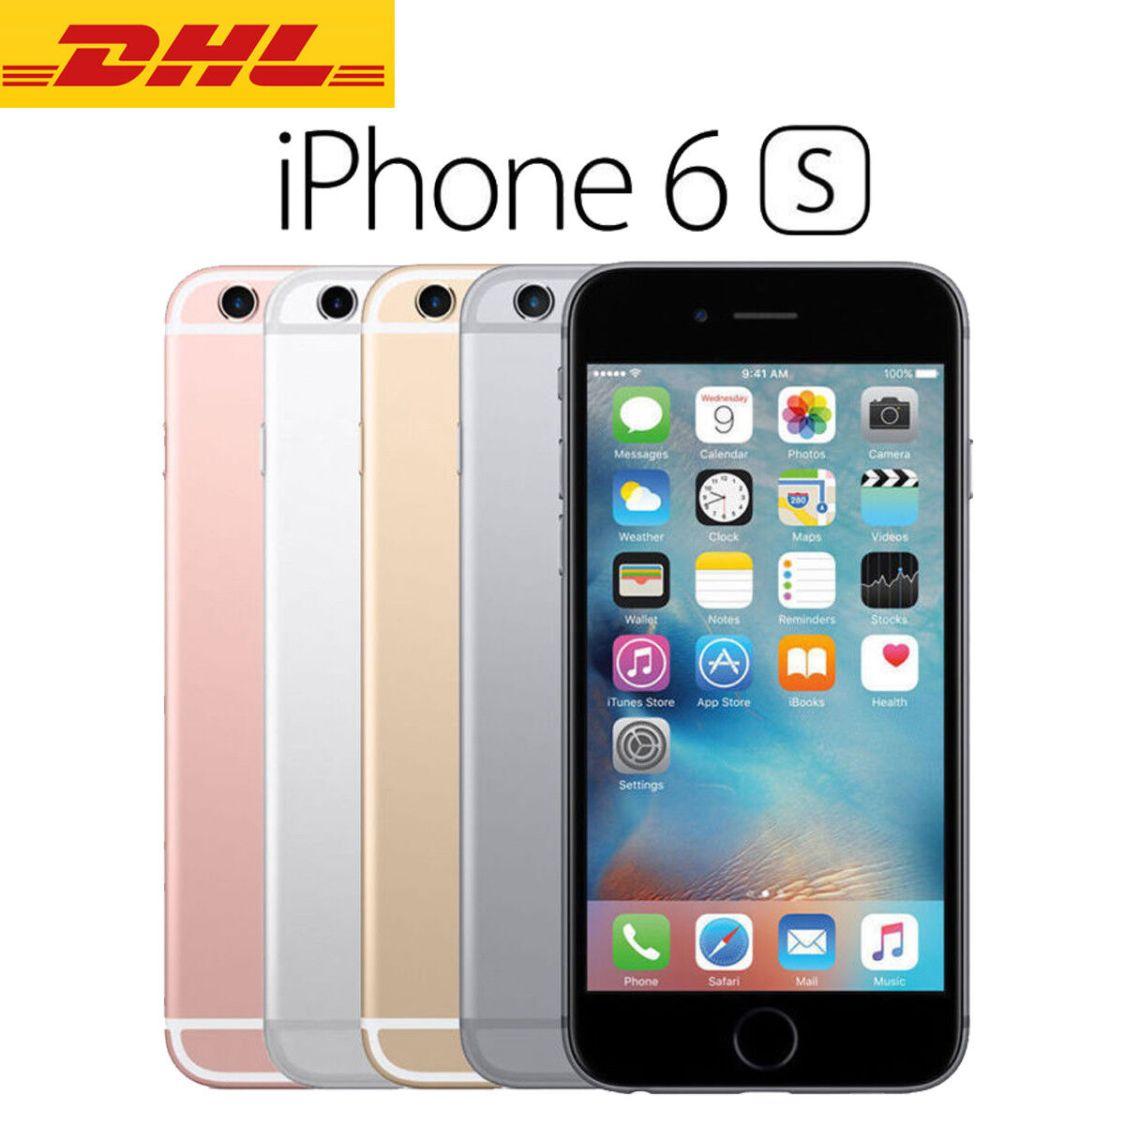 Apple iPhone 6S - 16GB - 32GB - 64GB - 128GB - Spacegrau Silber Rose Gold -DHL!